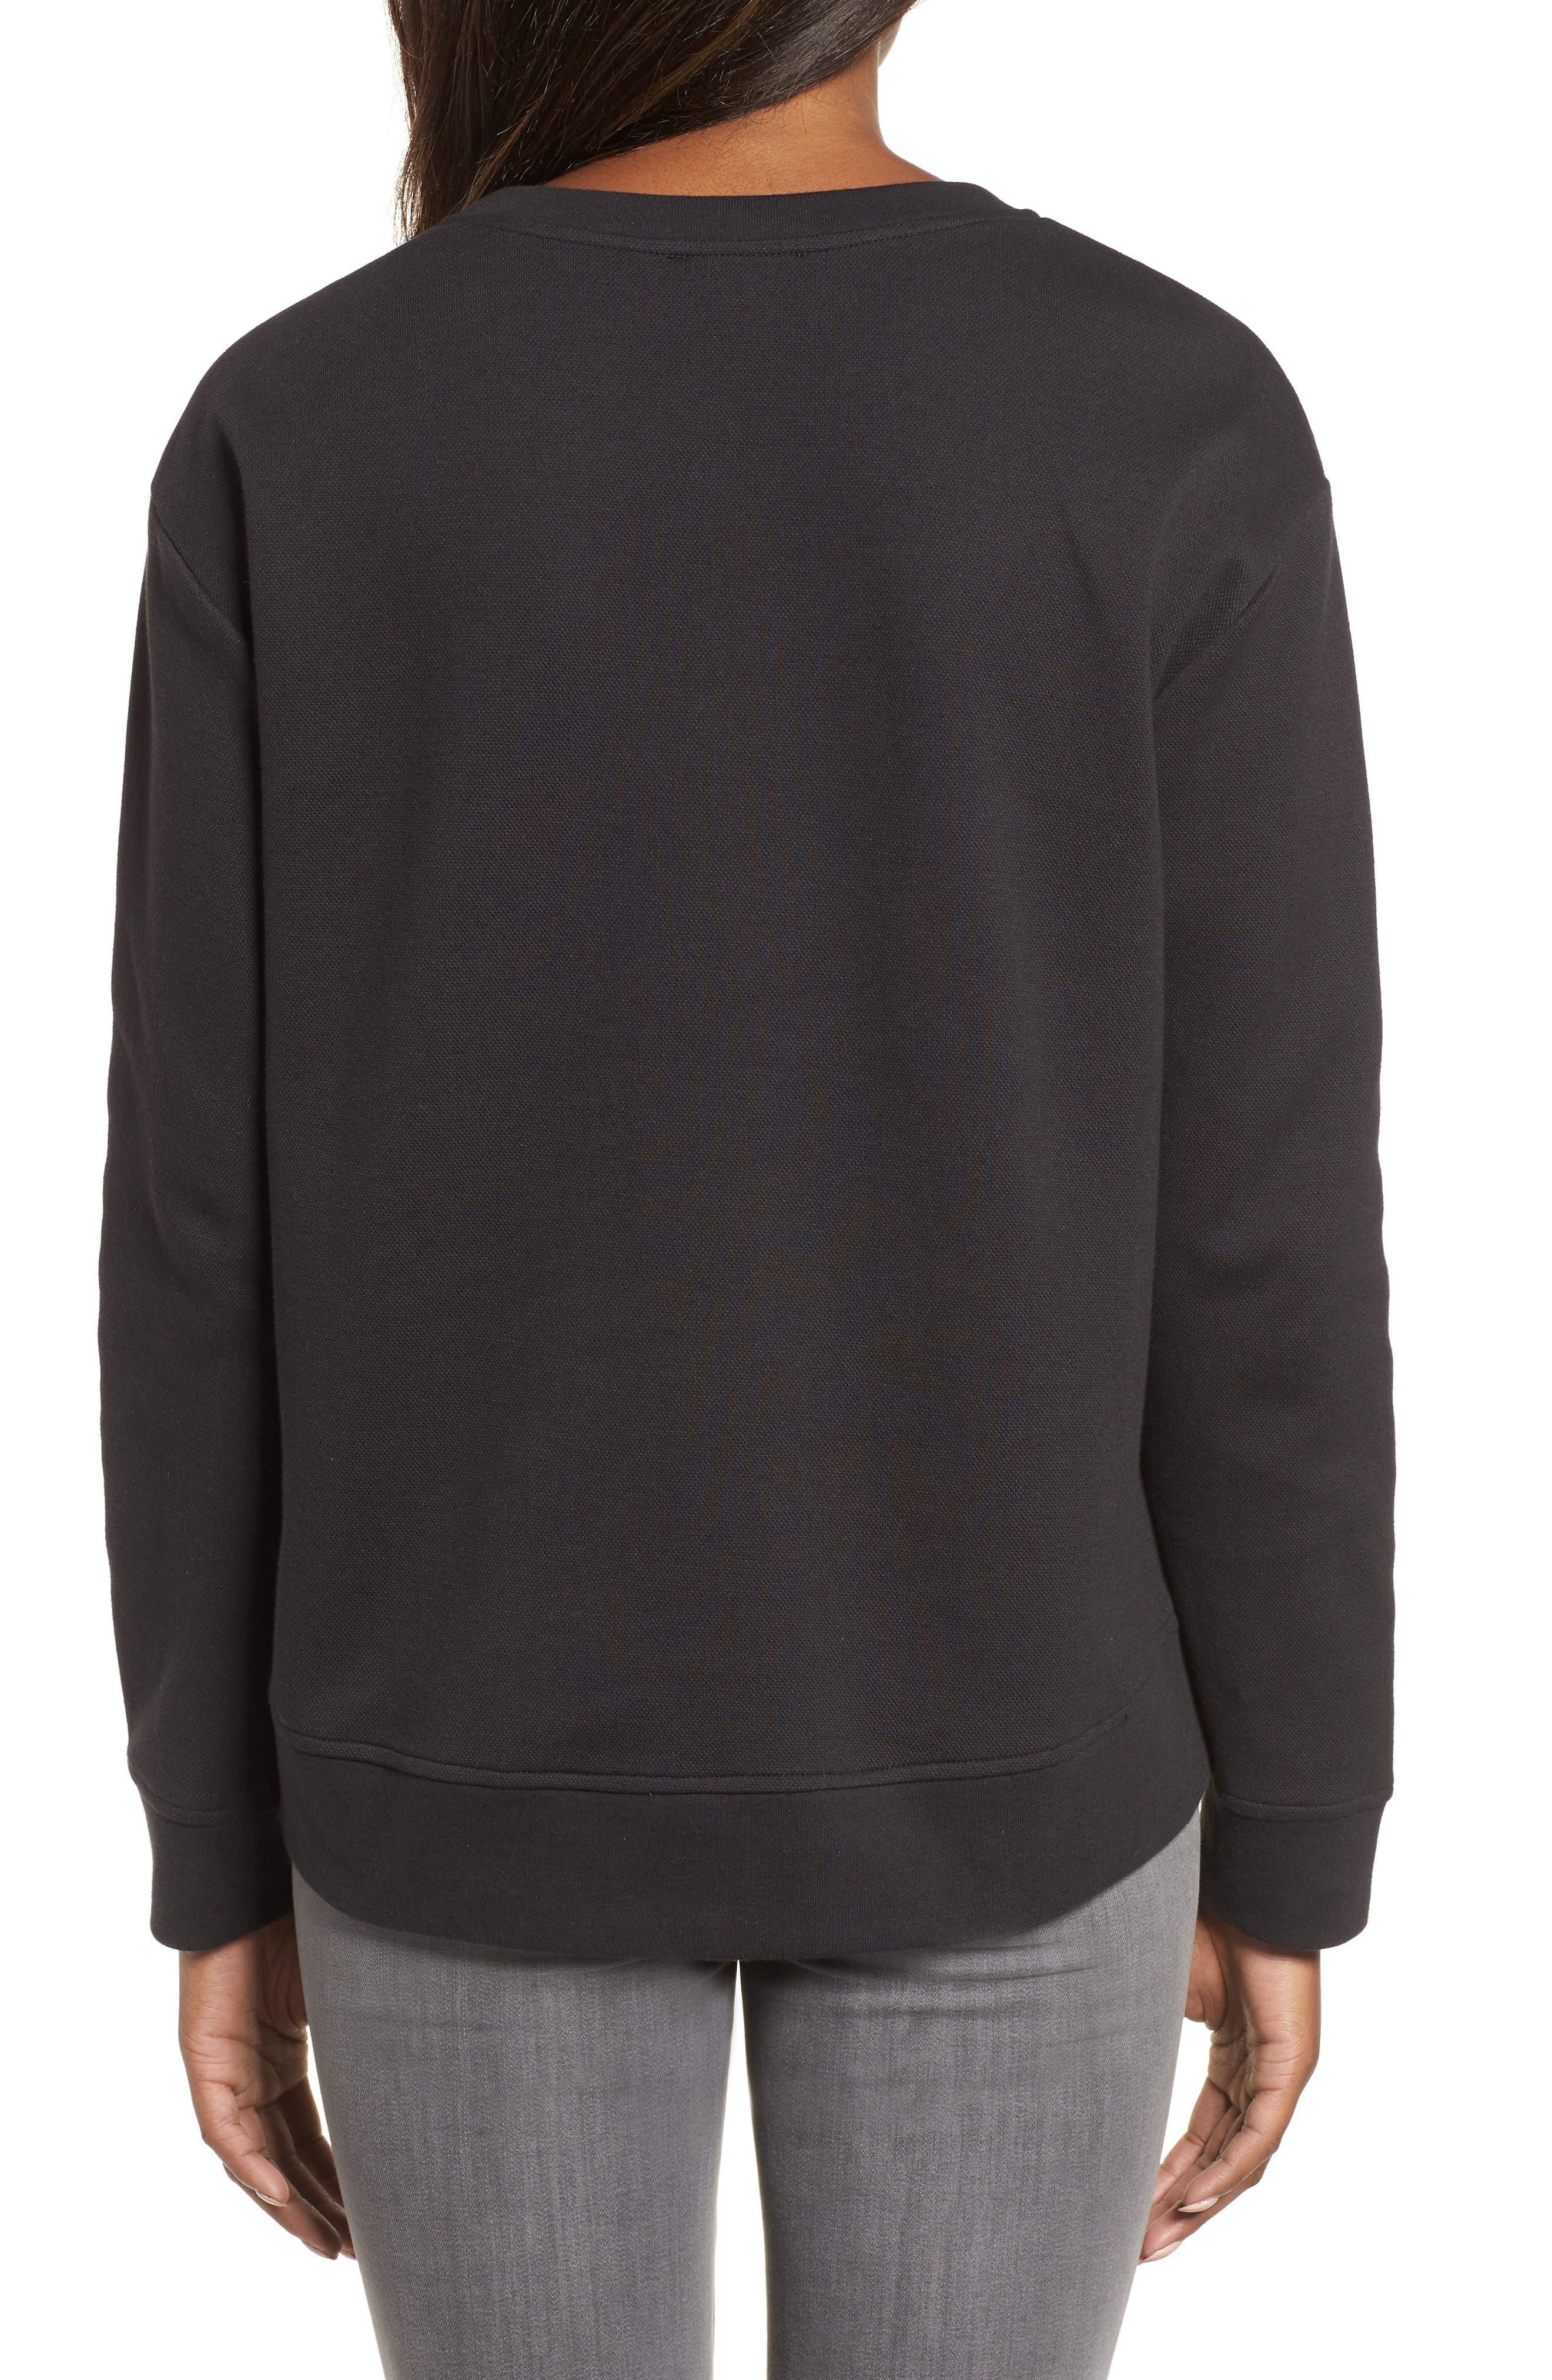 NYC Sweatshirt,                             Alternate thumbnail 2, color,                             BLACK